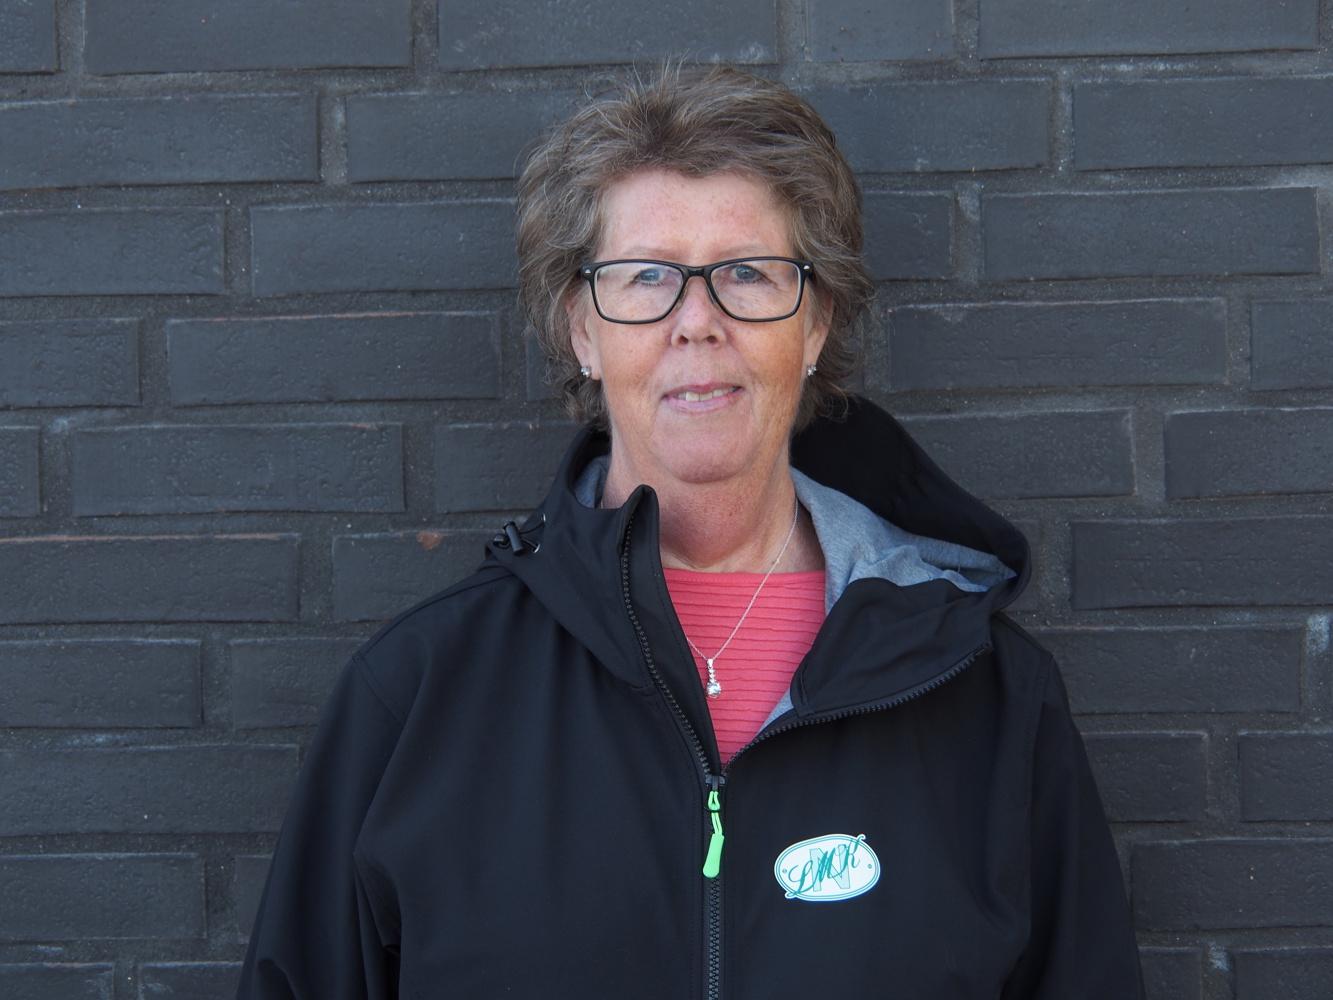 Kristin Risø style=